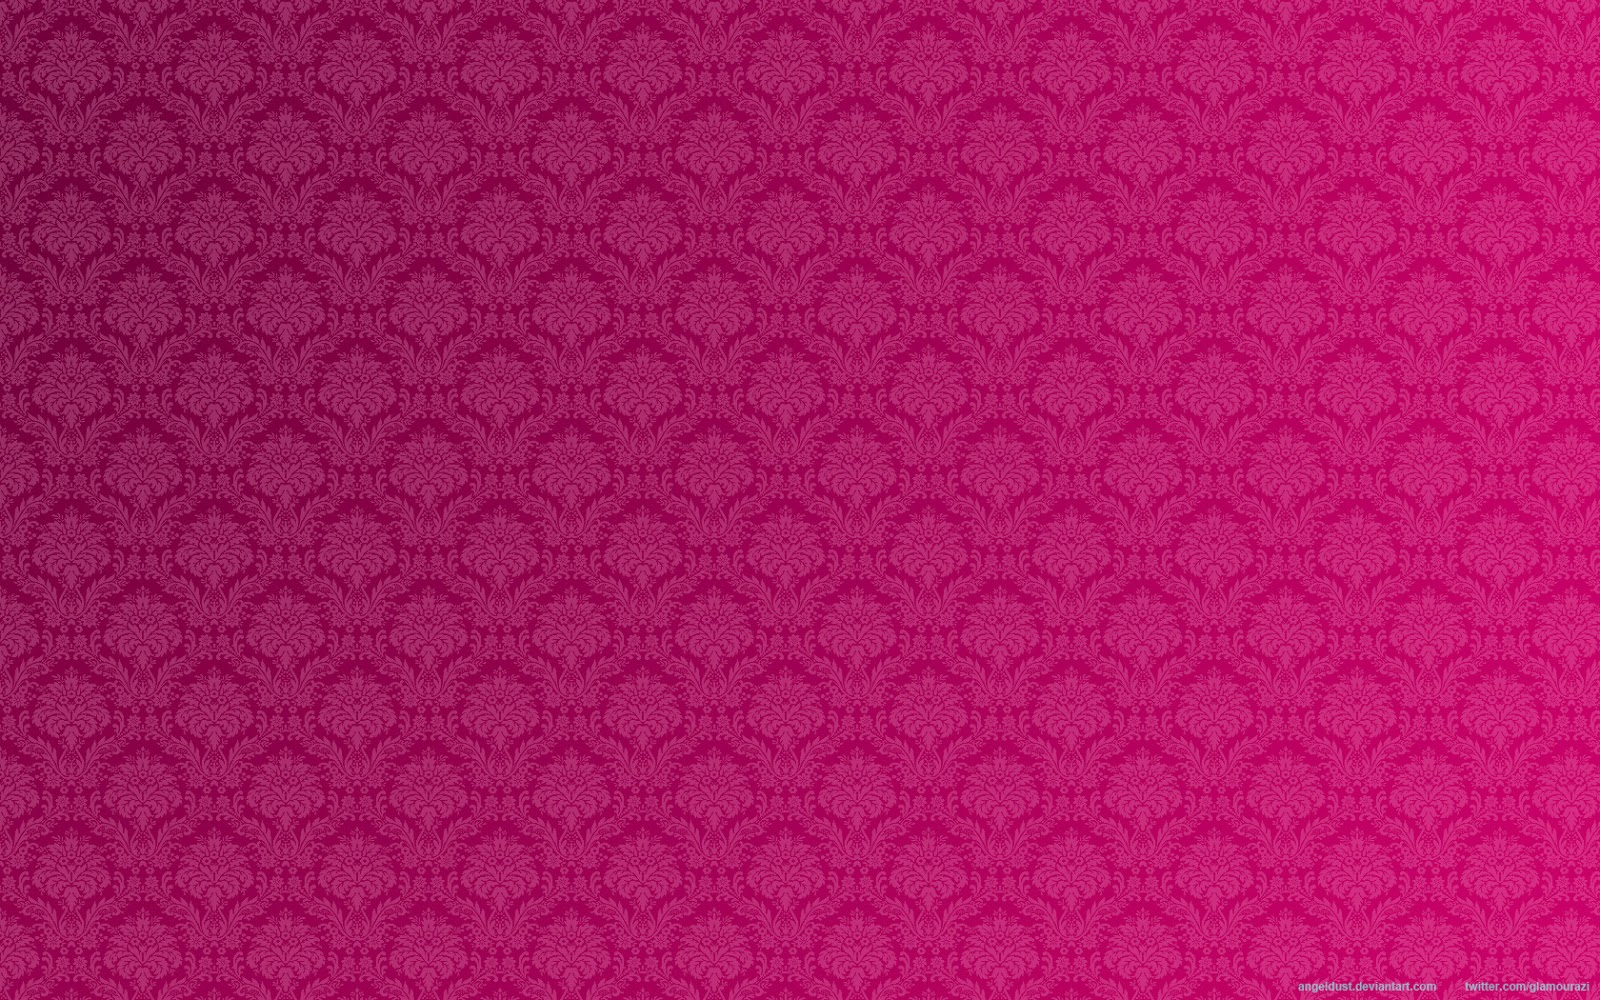 Pink damask wallpaper 30 hd wallpaper for Damask wallpaper